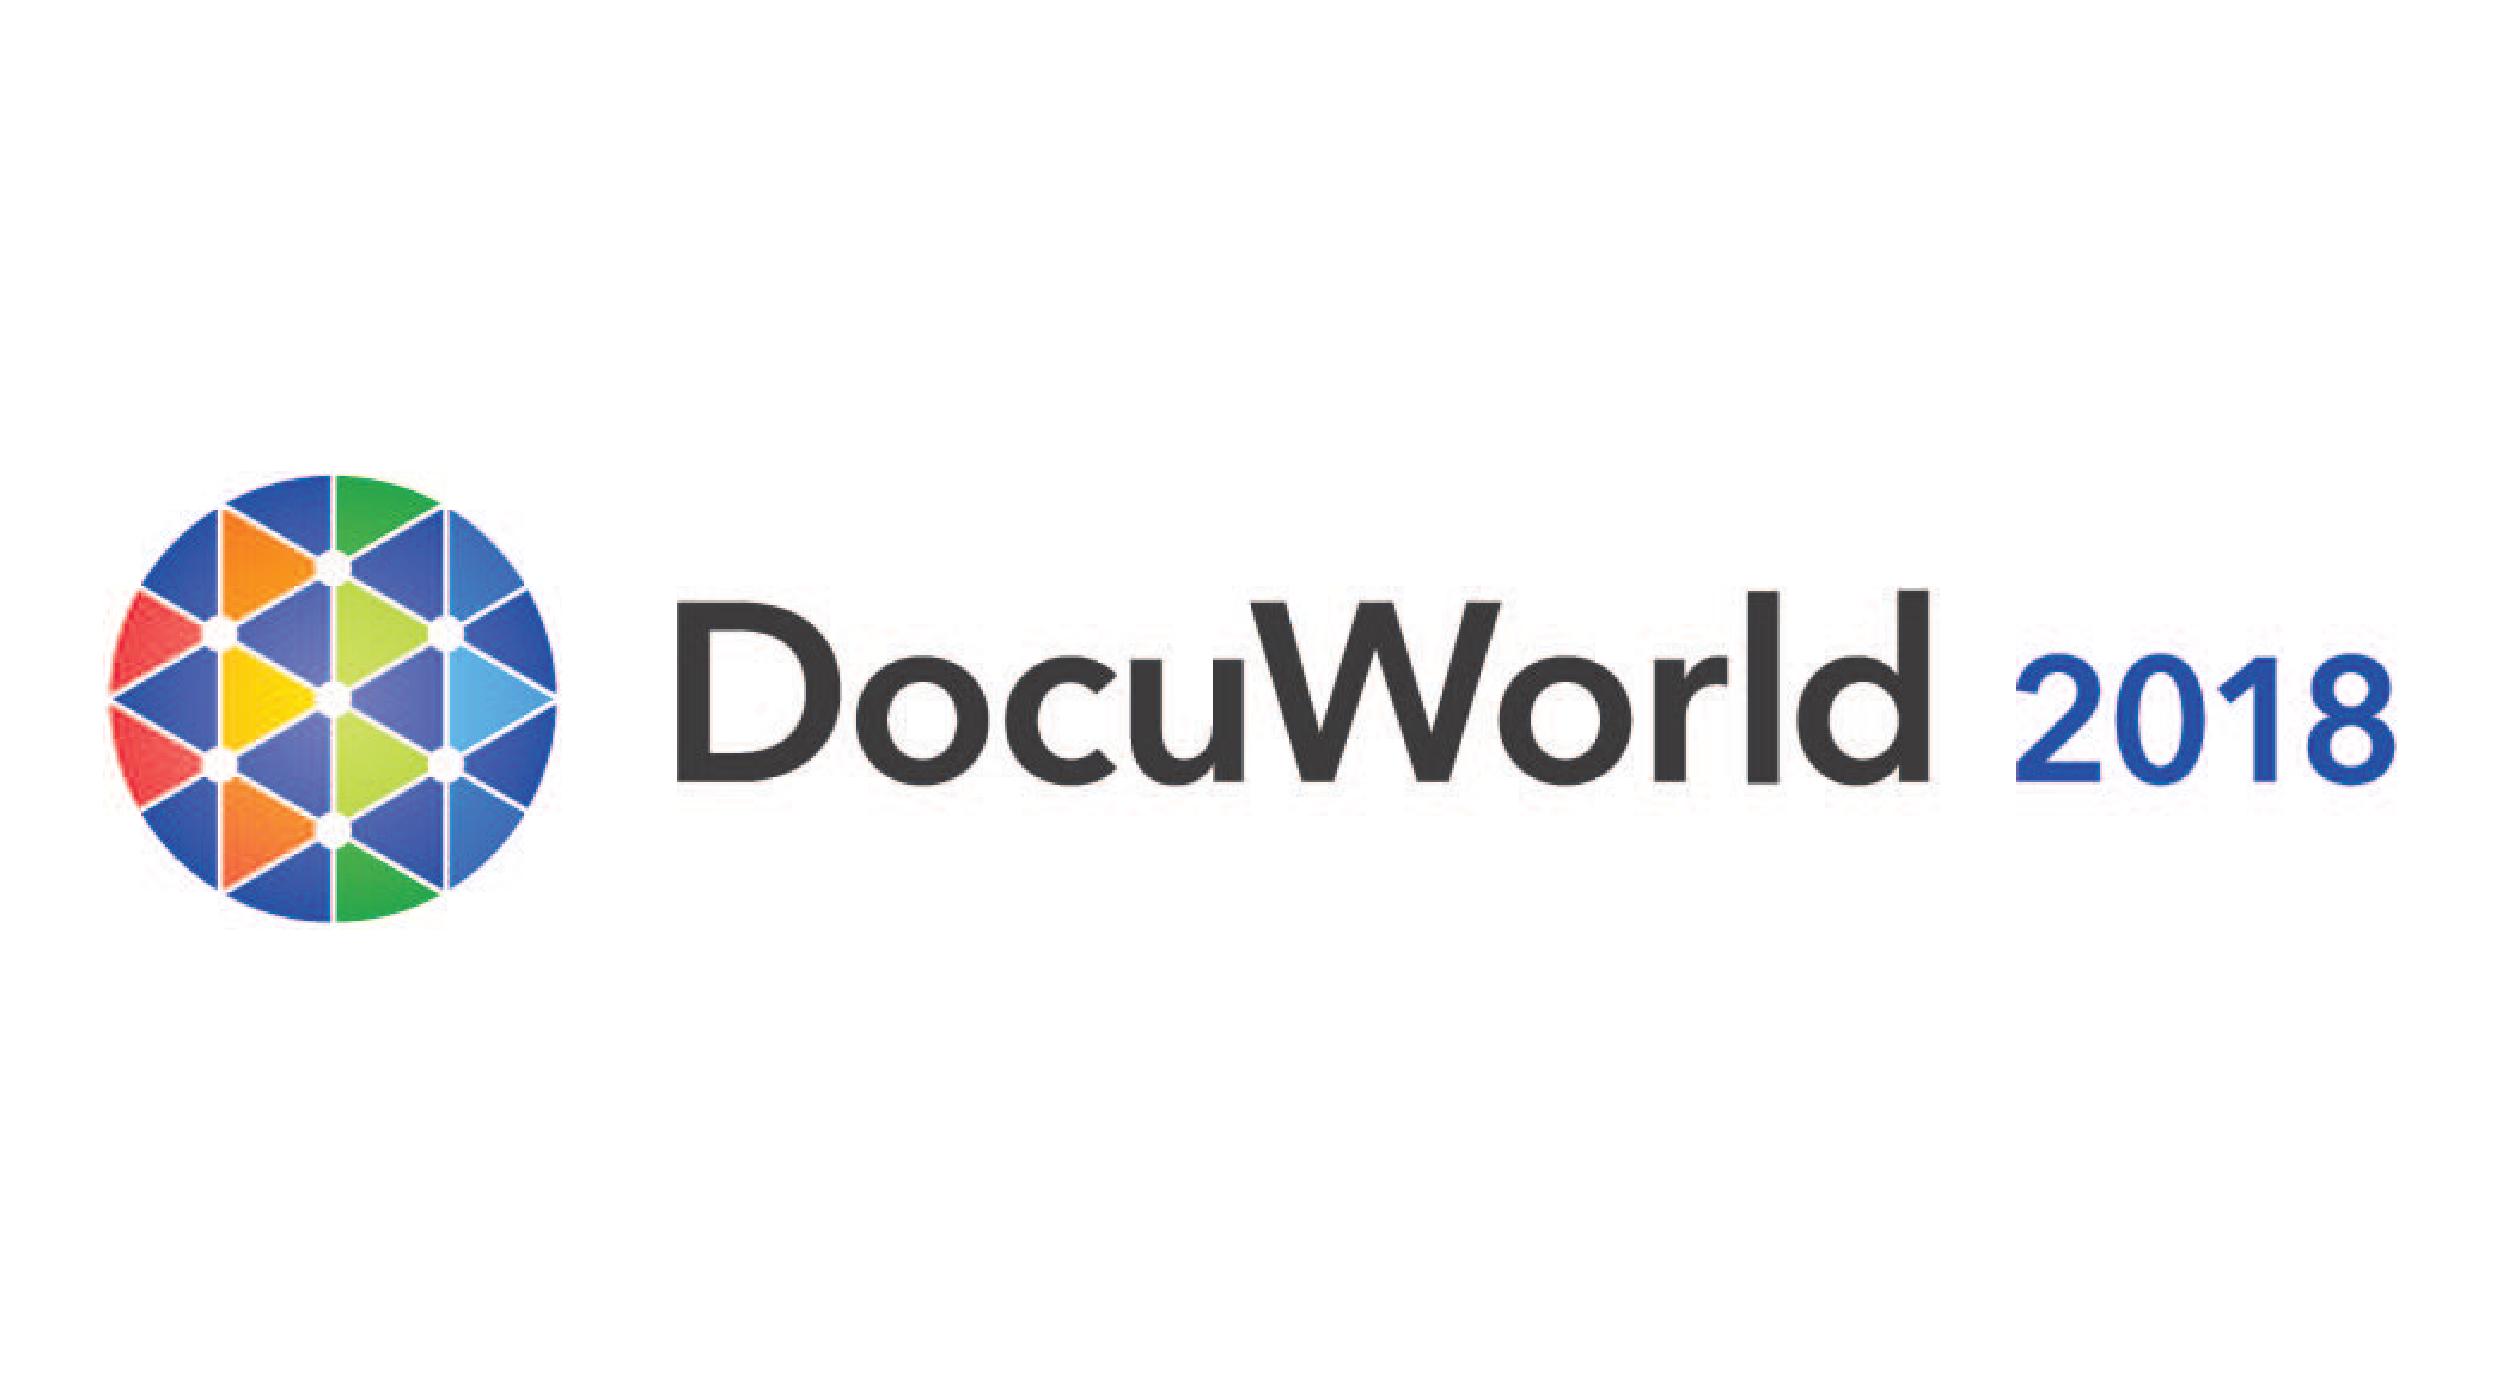 DocuWorld Logo - Square - CMYK - 72 dpi-2